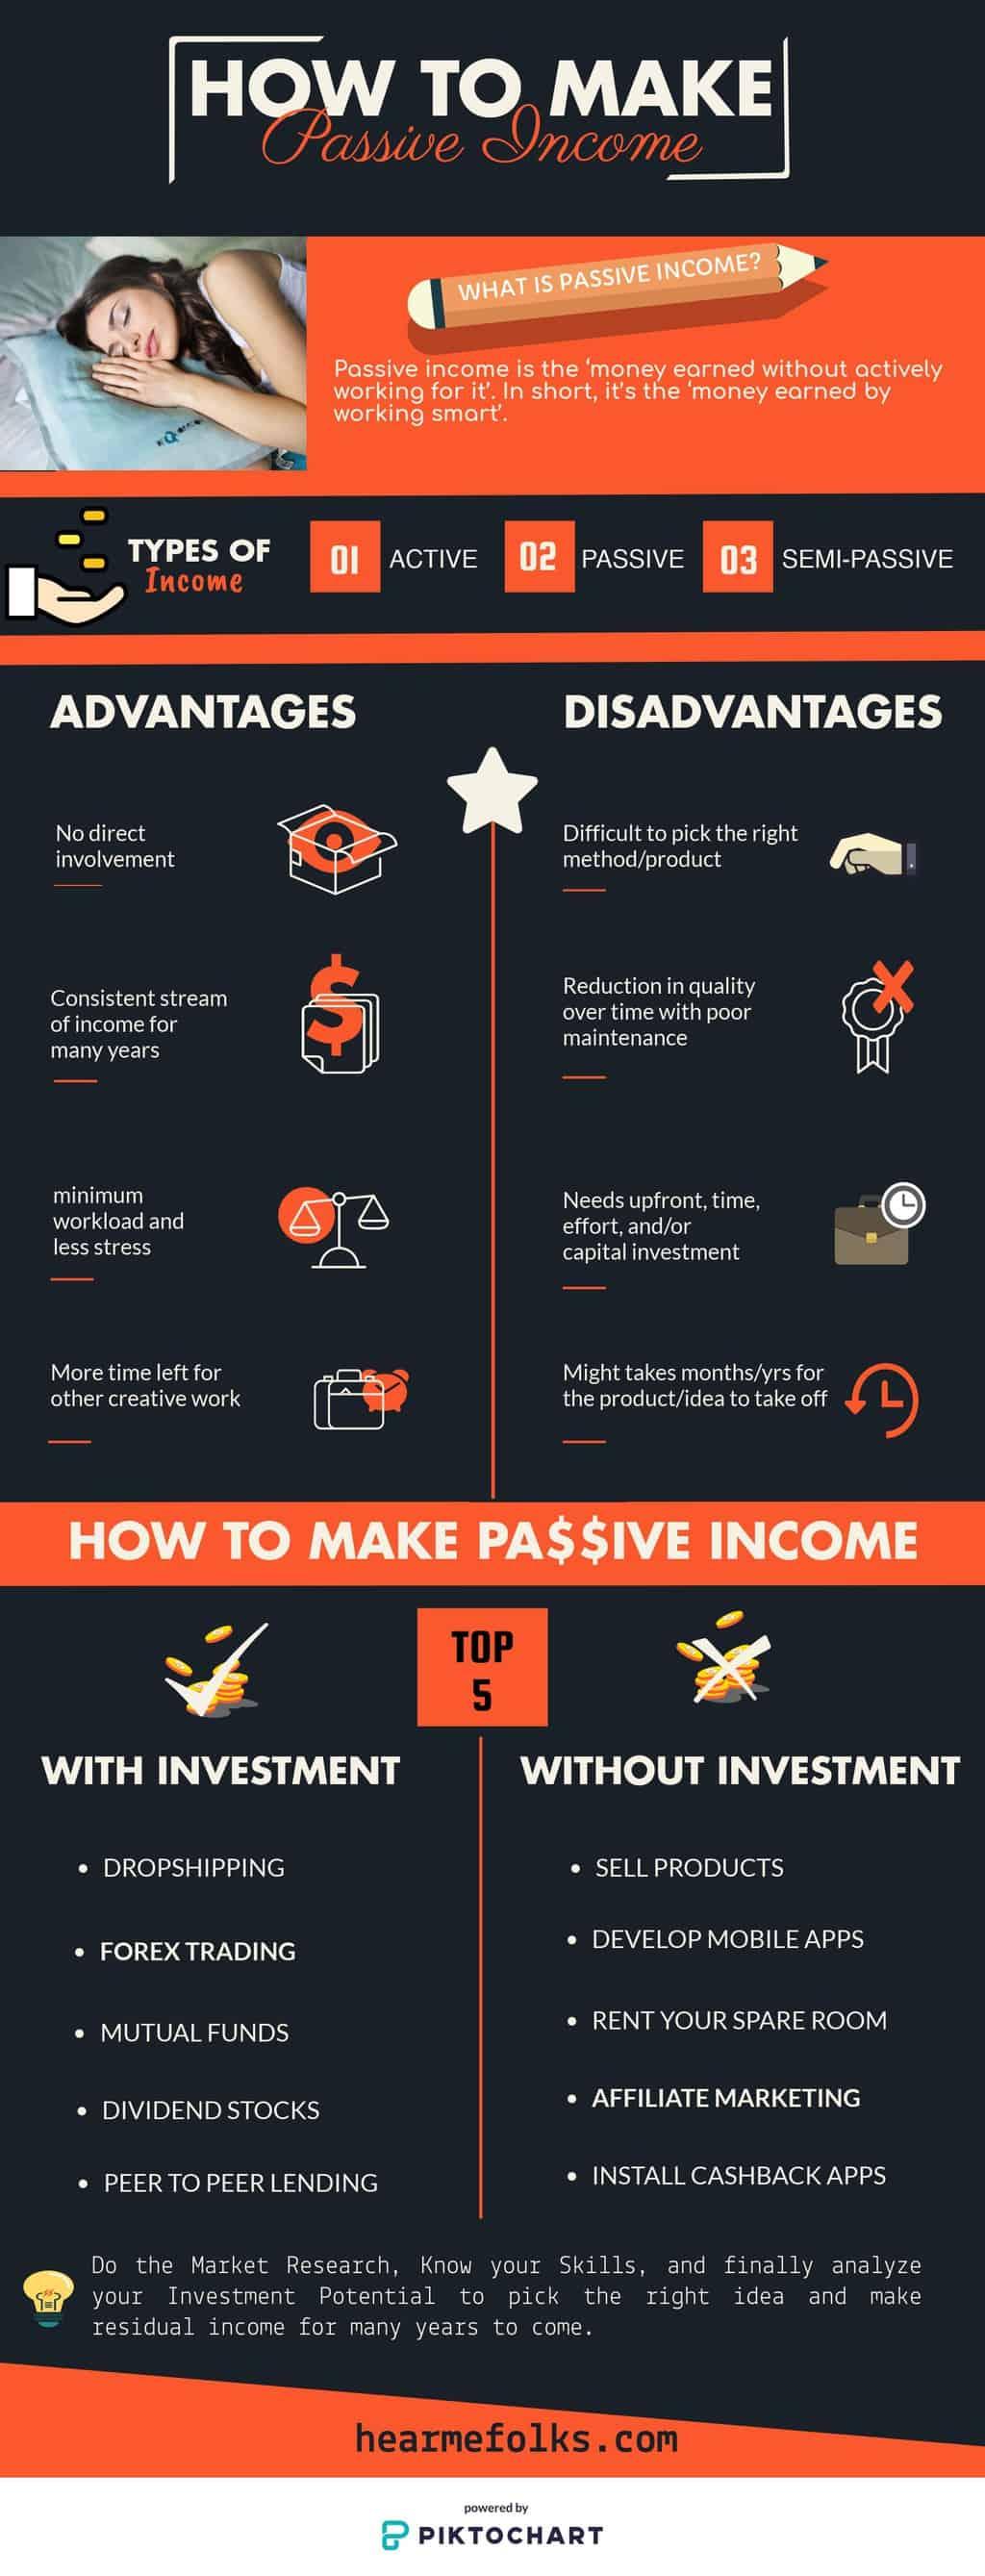 passive income ideas to make money while you sleep